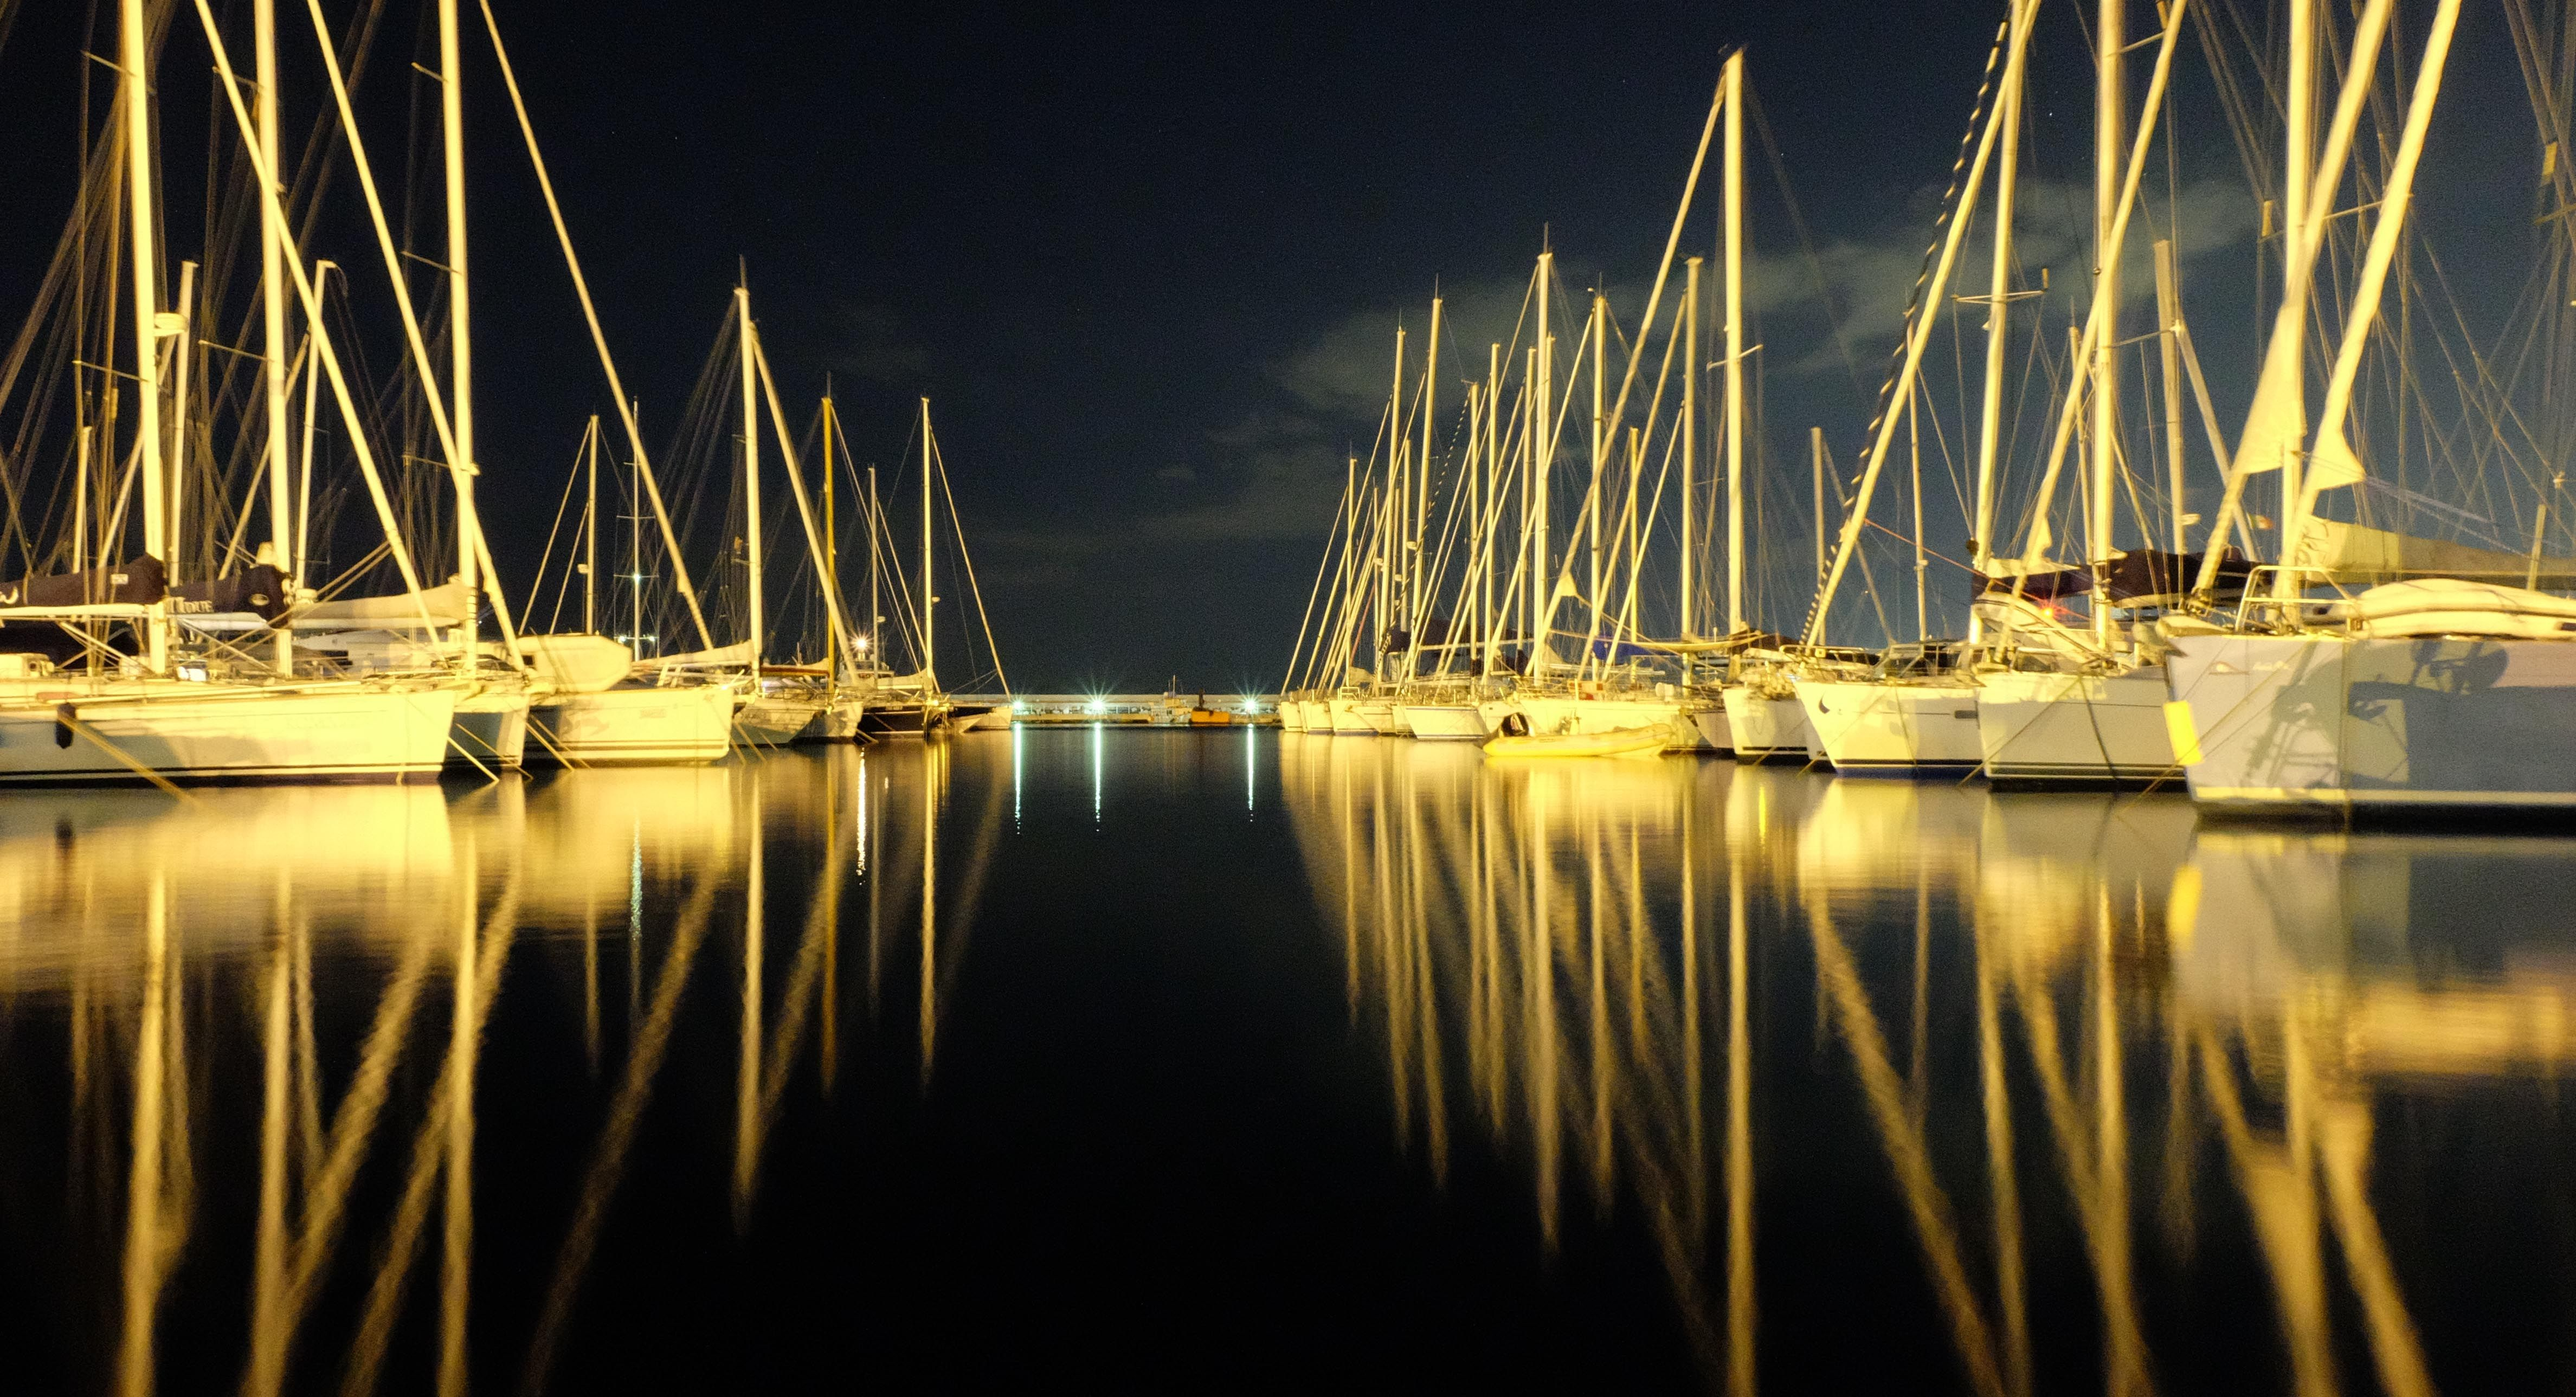 Boat sleeping at dock in Procida - italy - copyright Michele Pilotto #sailingandsea #sailingcharter #charter #vacanzaavela #sailingholiday #sailyacht #barcheavela